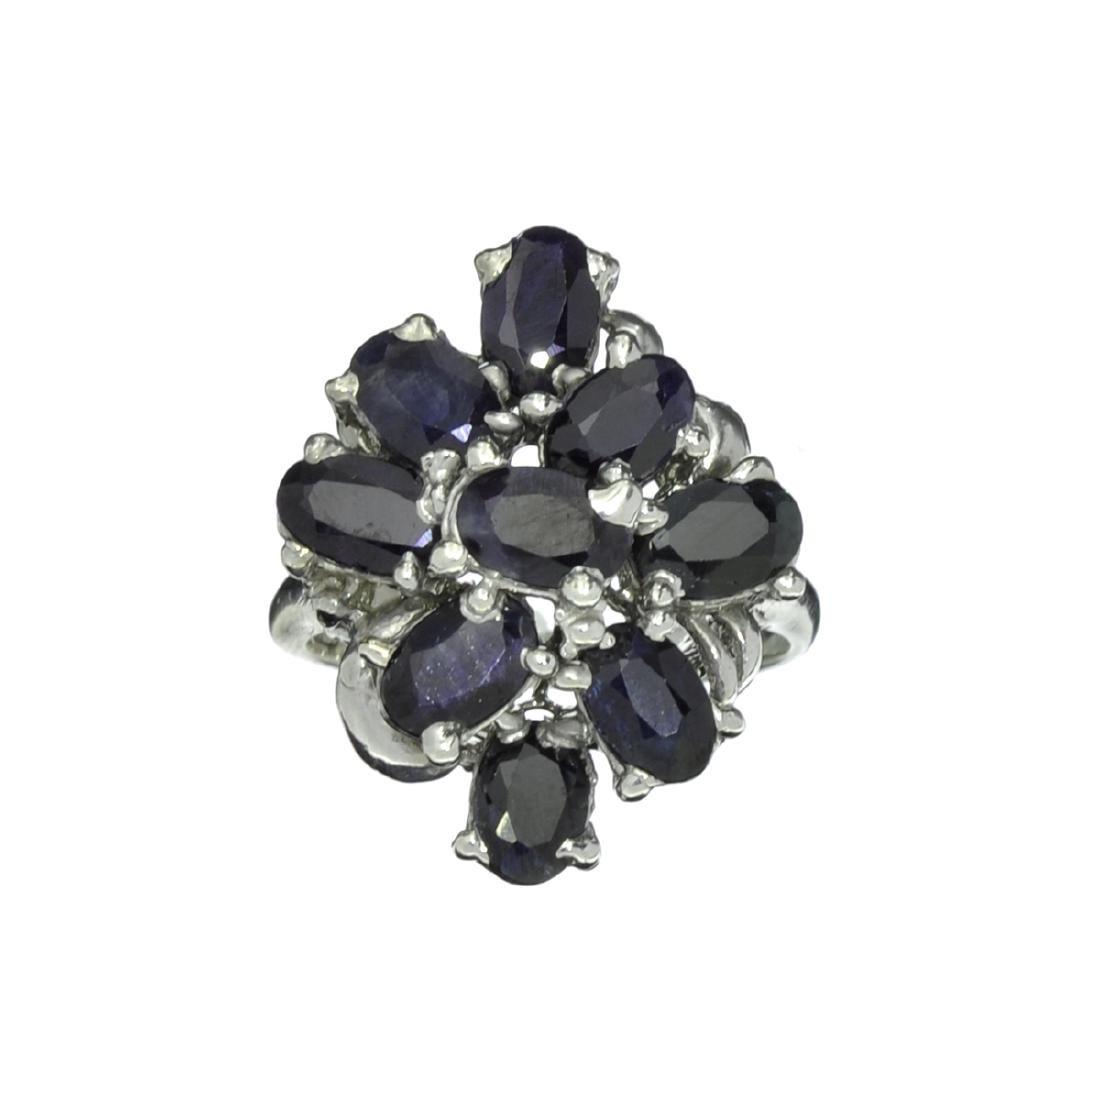 Fine Jewelry Designer Sebastian 1.75CT Oval Cut Bllue